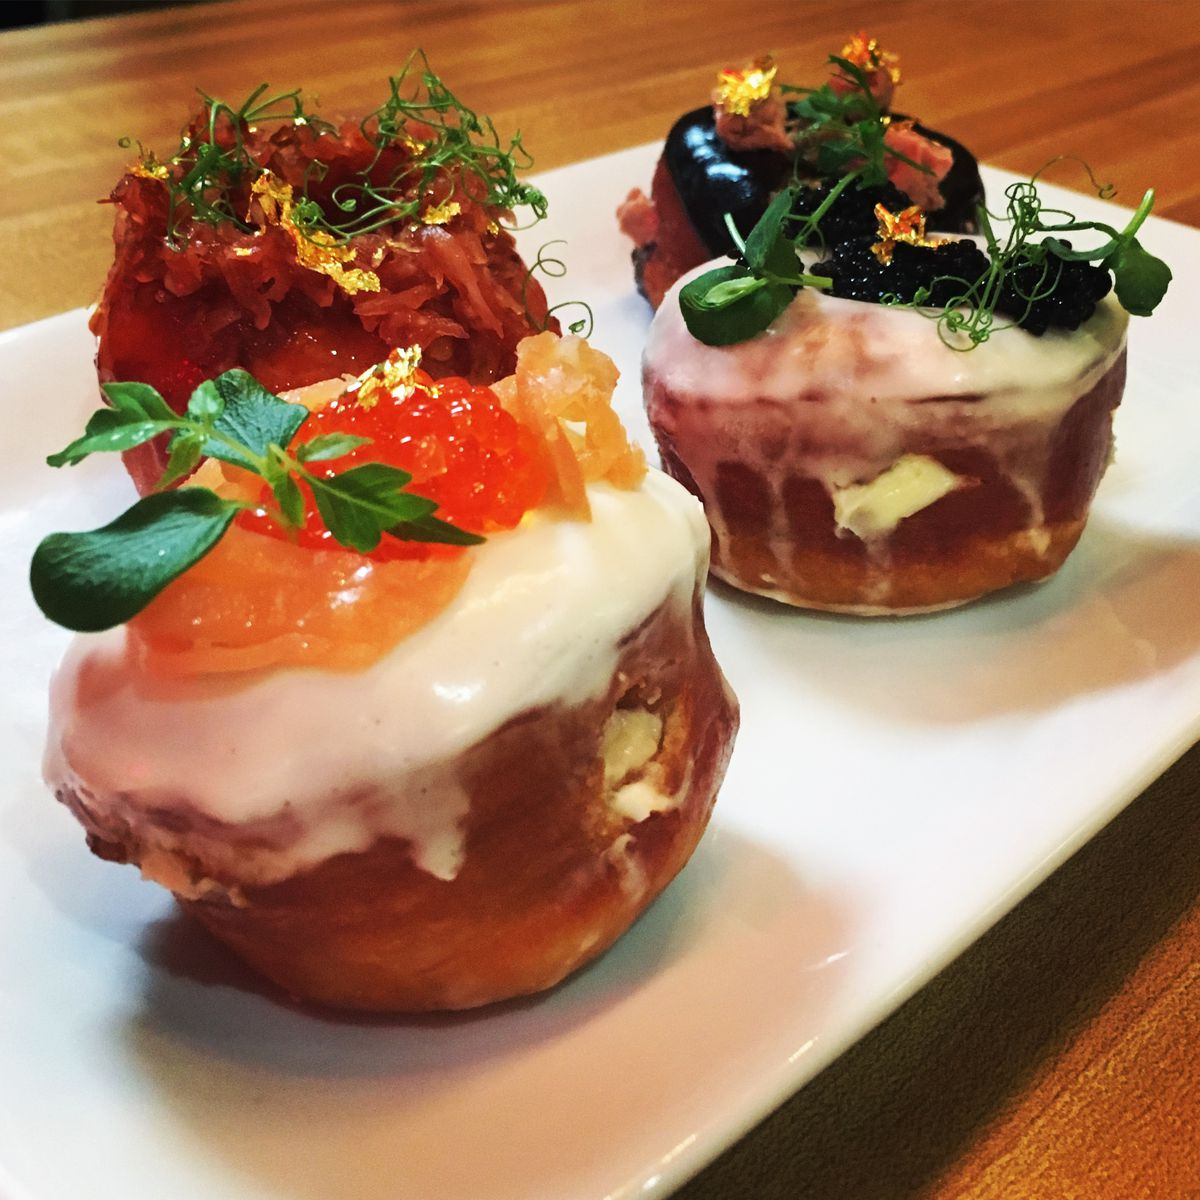 Forbidden Donuts' kimchi doughnut